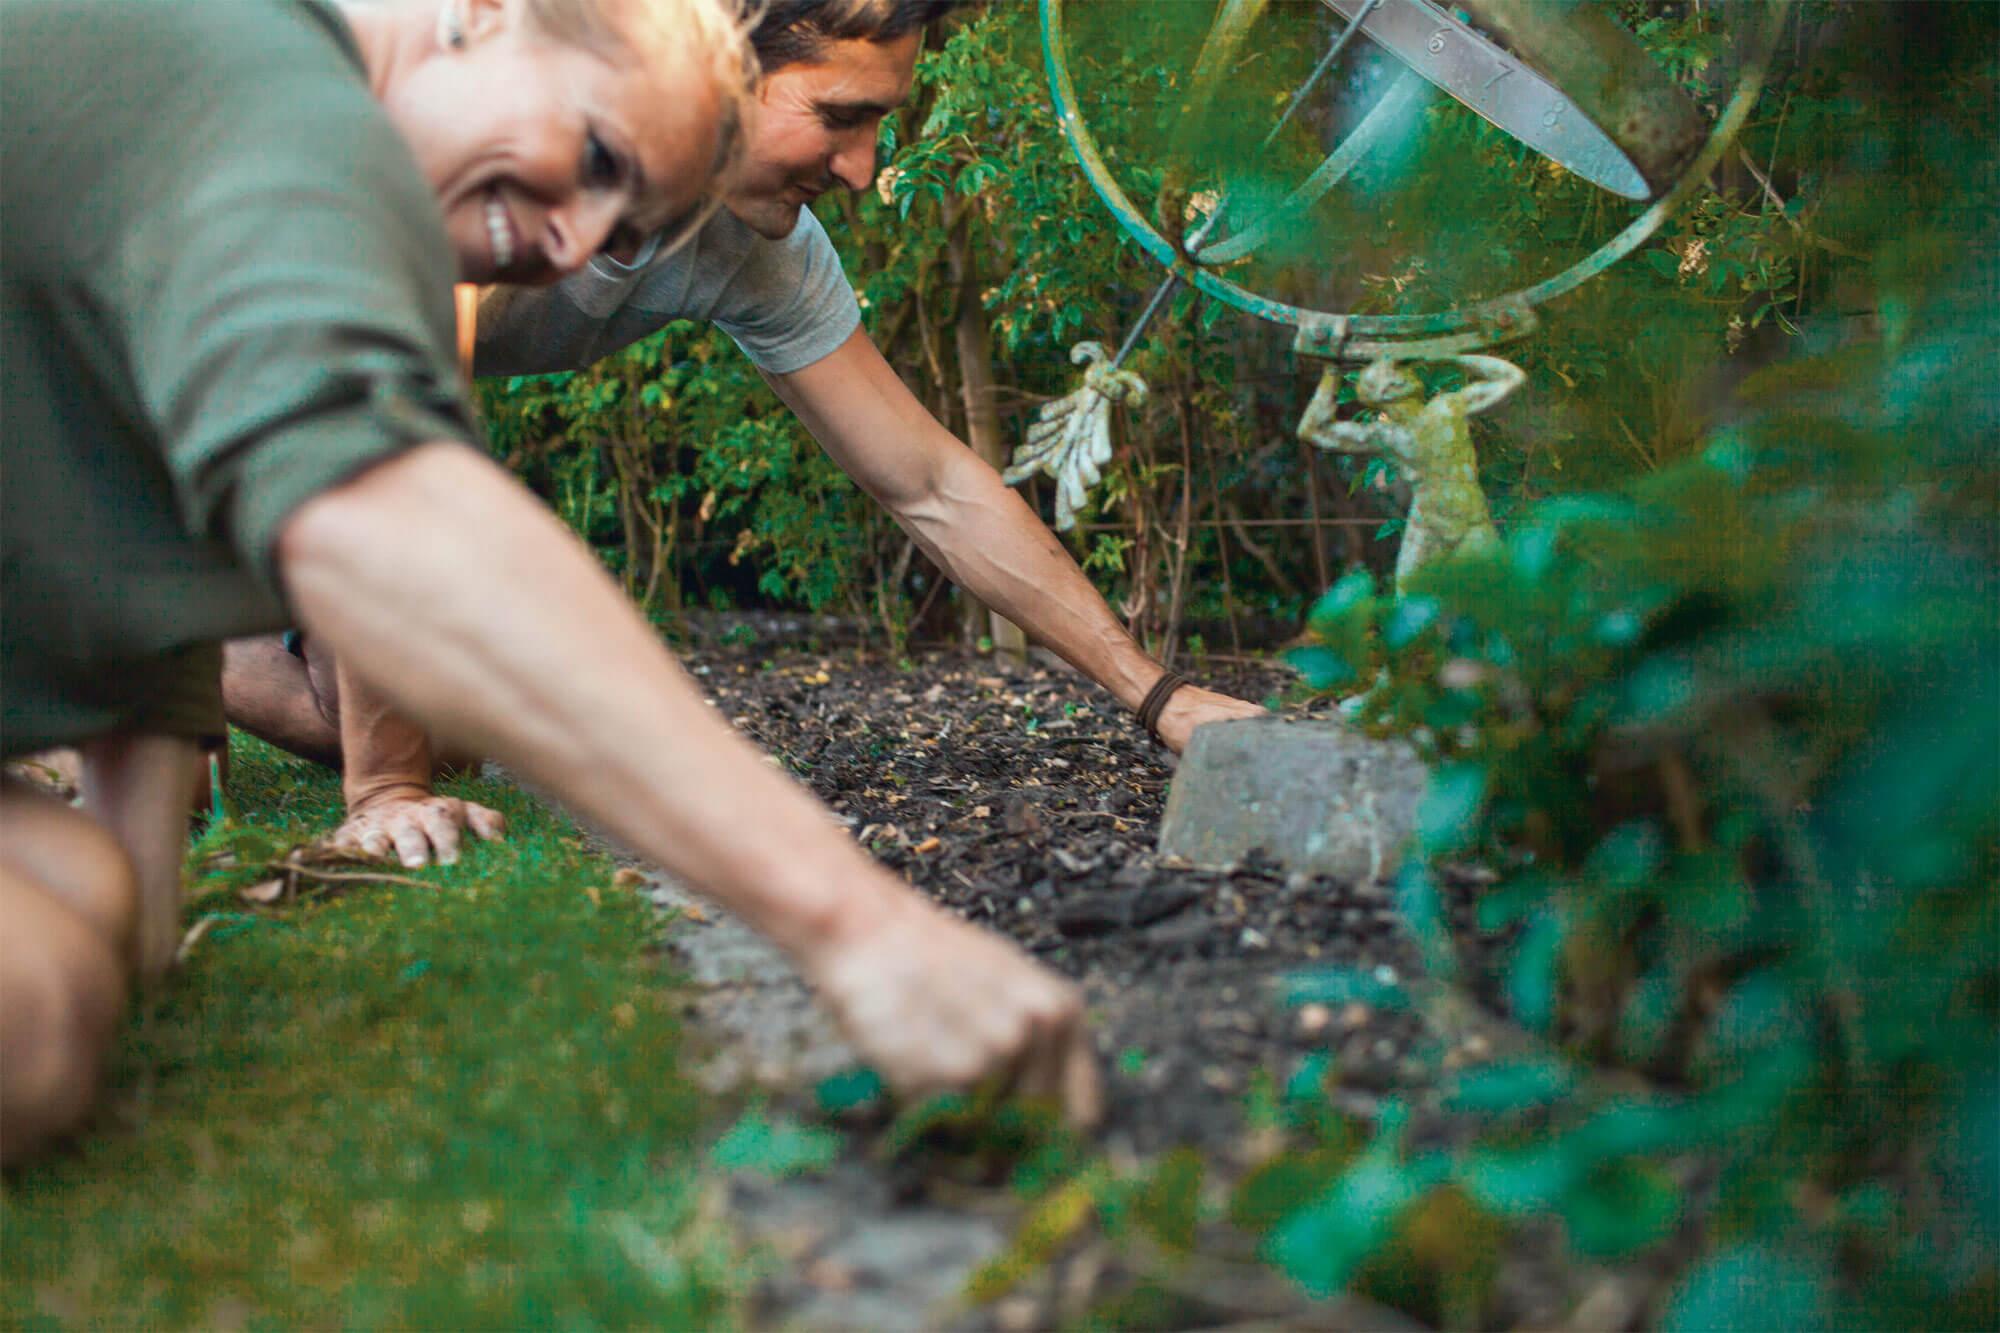 Jardin : Garden Party - La Salamandre